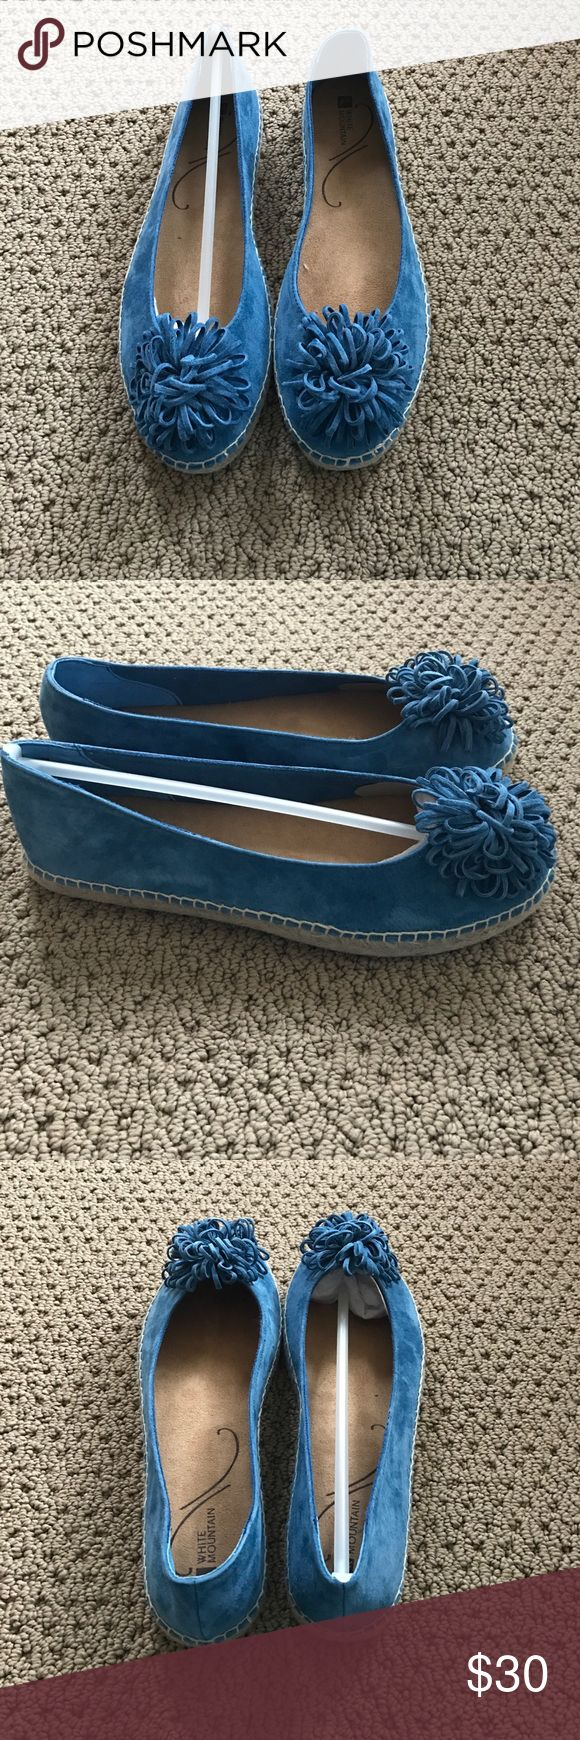 White mountain espadrilles shoes never worn Light blue espadrilles with flower white mountain Shoes Espadrilles